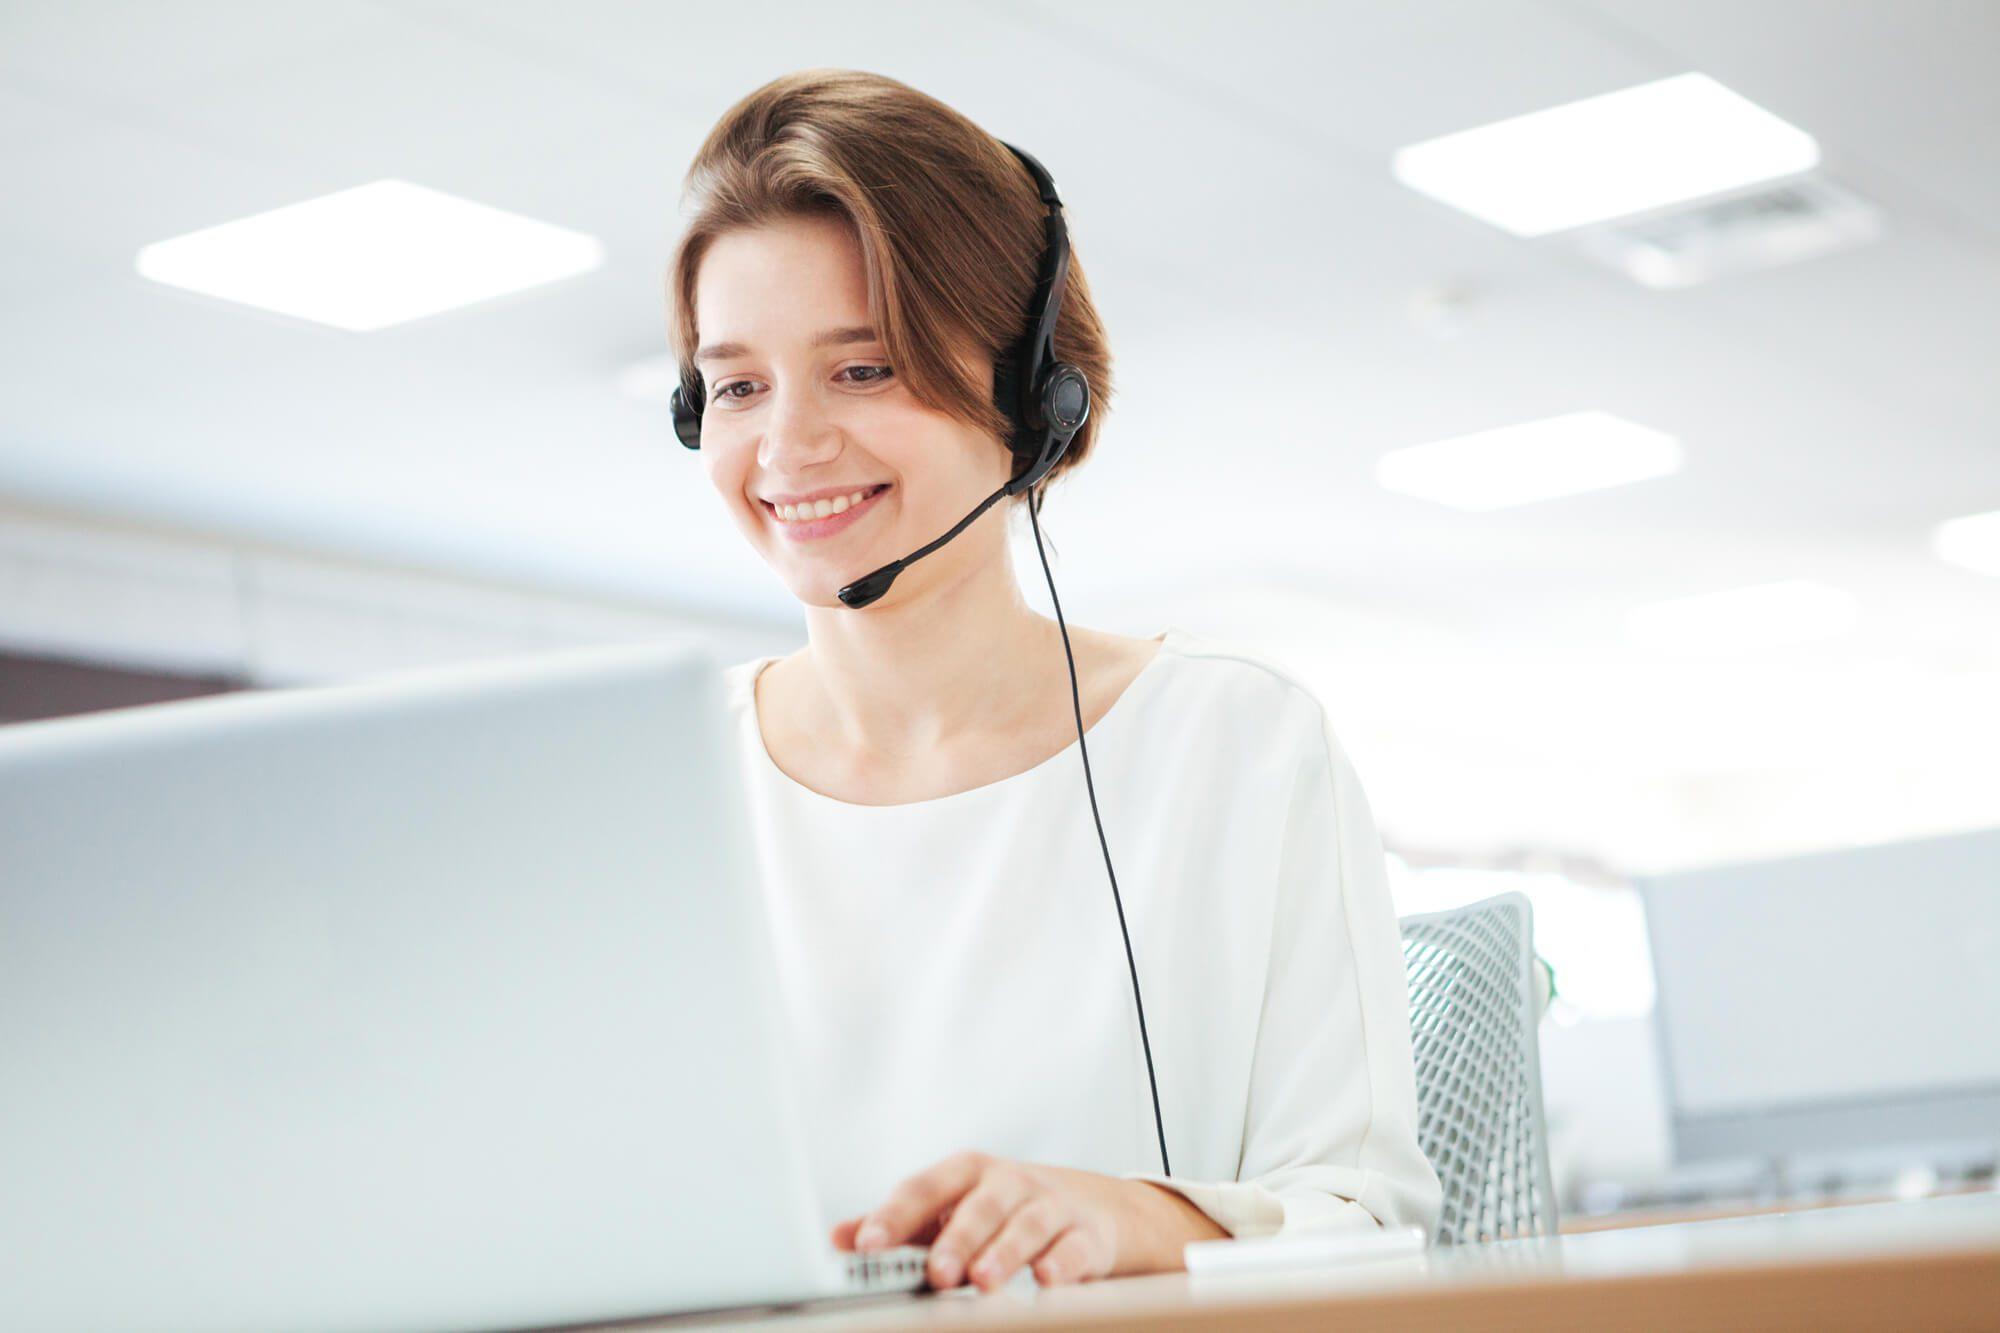 tecnologia para contact center como pode reduzir os custos da empresa